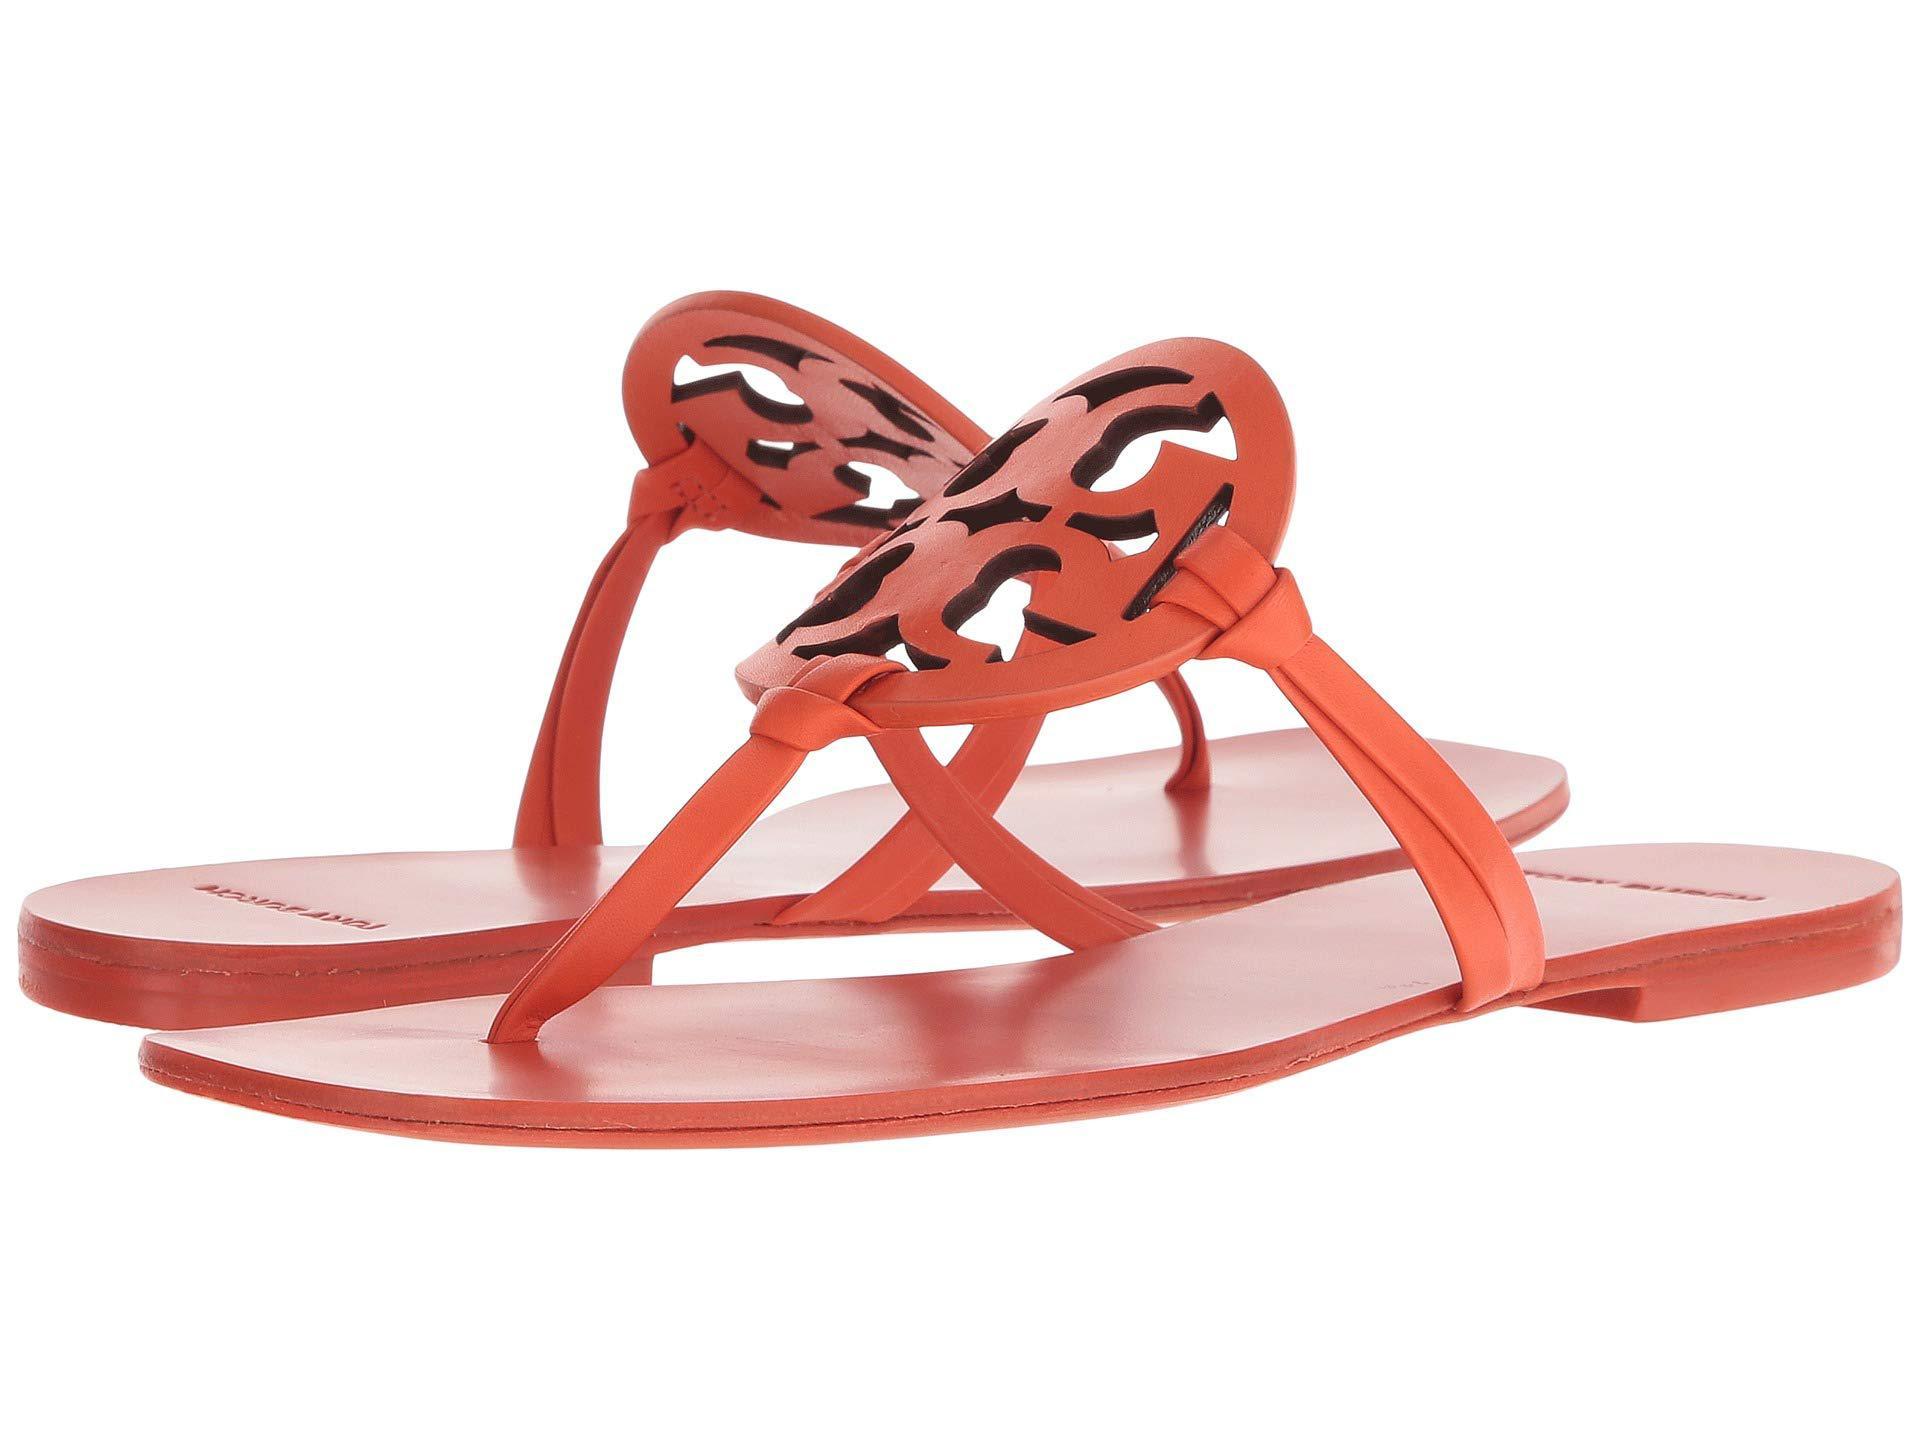 ee8c2ac90f04 Lyst - Tory Burch Miller Square Toe (sweet Tangerine) Women s Shoes